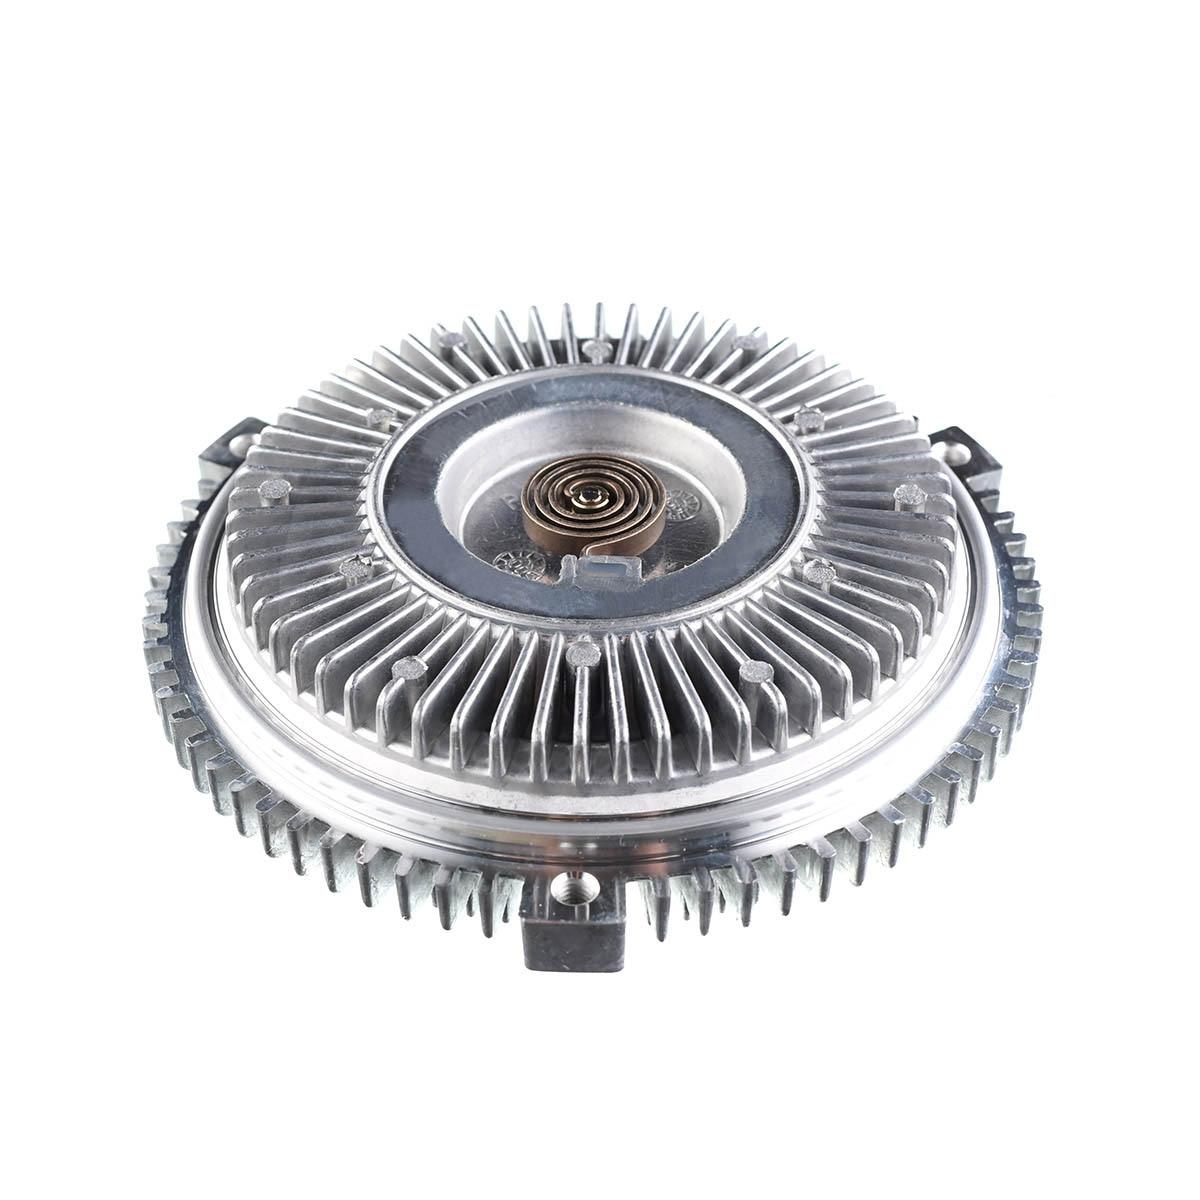 Engine Cooling Fan Blade /& Fan Clutch for BMW 530i 540i 740i 740iL 840Ci 850CSi